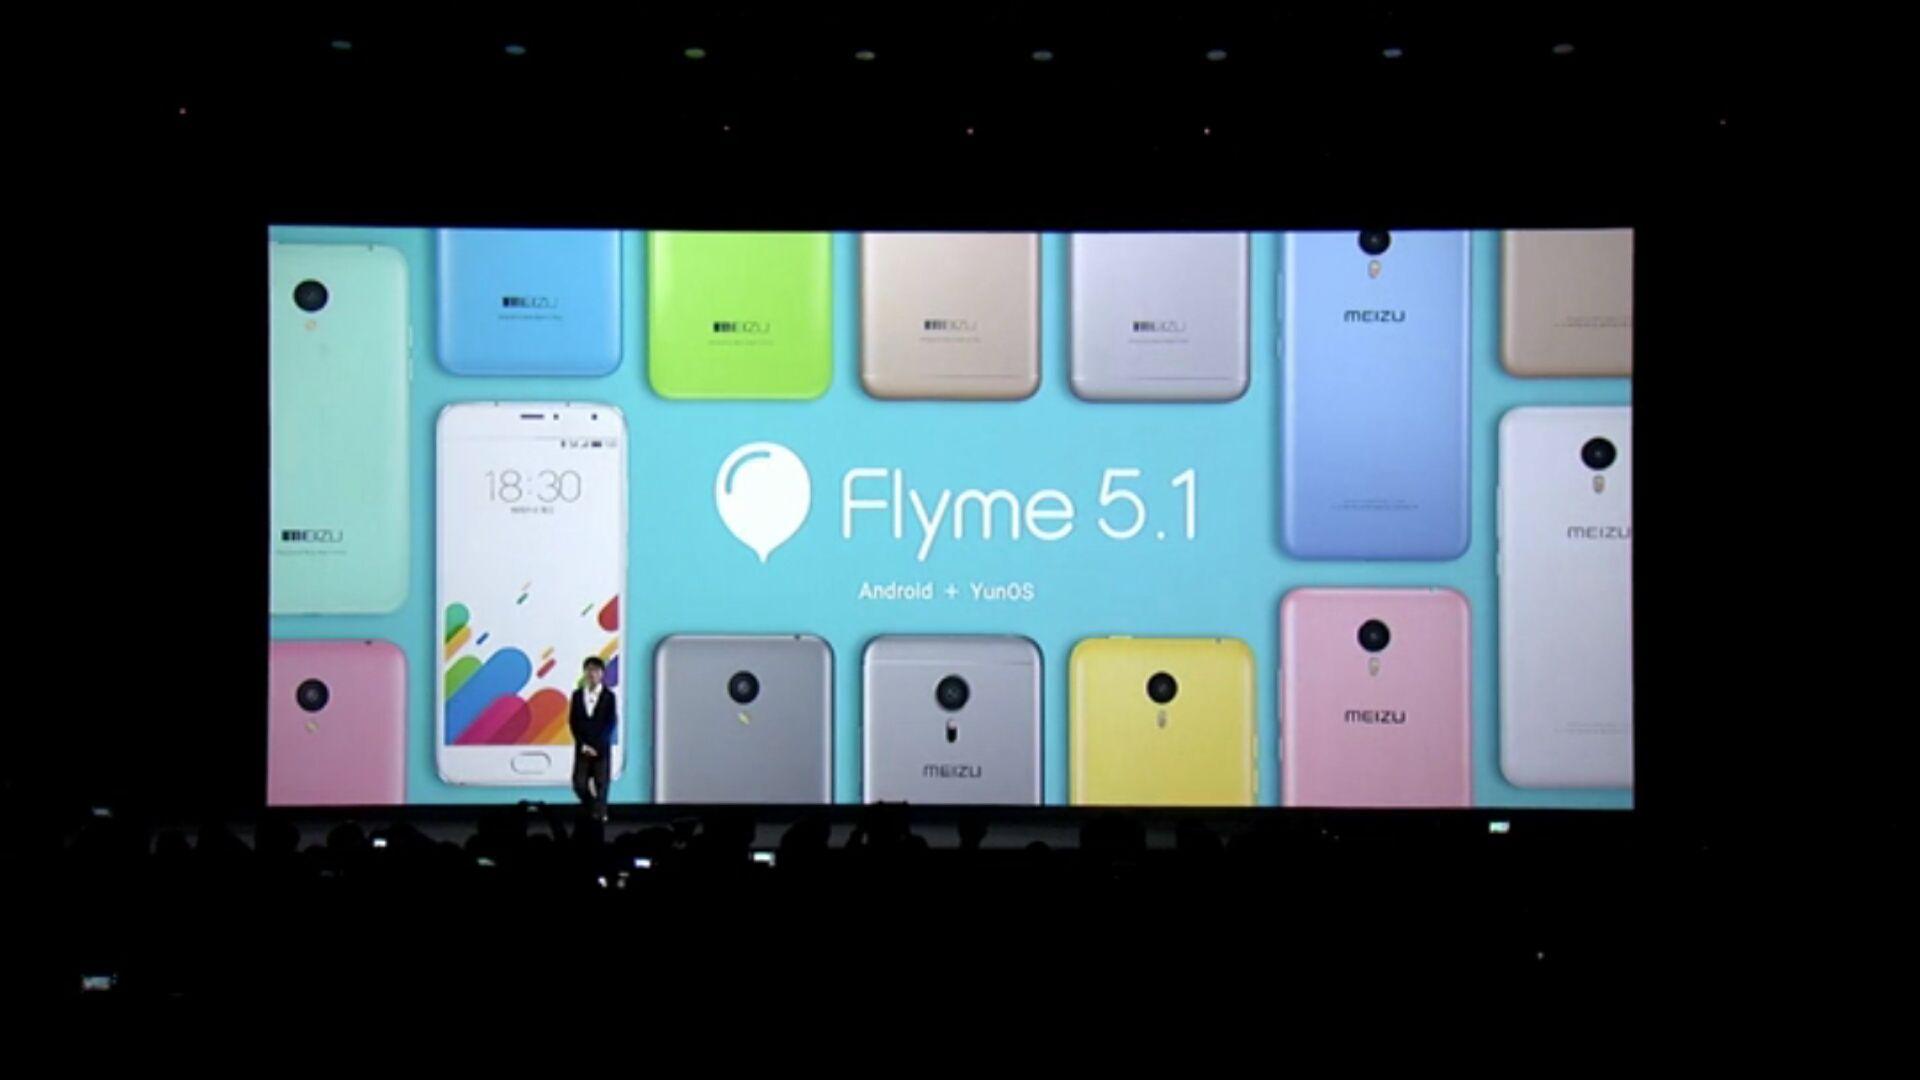 Flyme OS 5.0を改良したFlyme OS 5.1を発表。魅蓝metal(Meilan metal)に初期搭載。